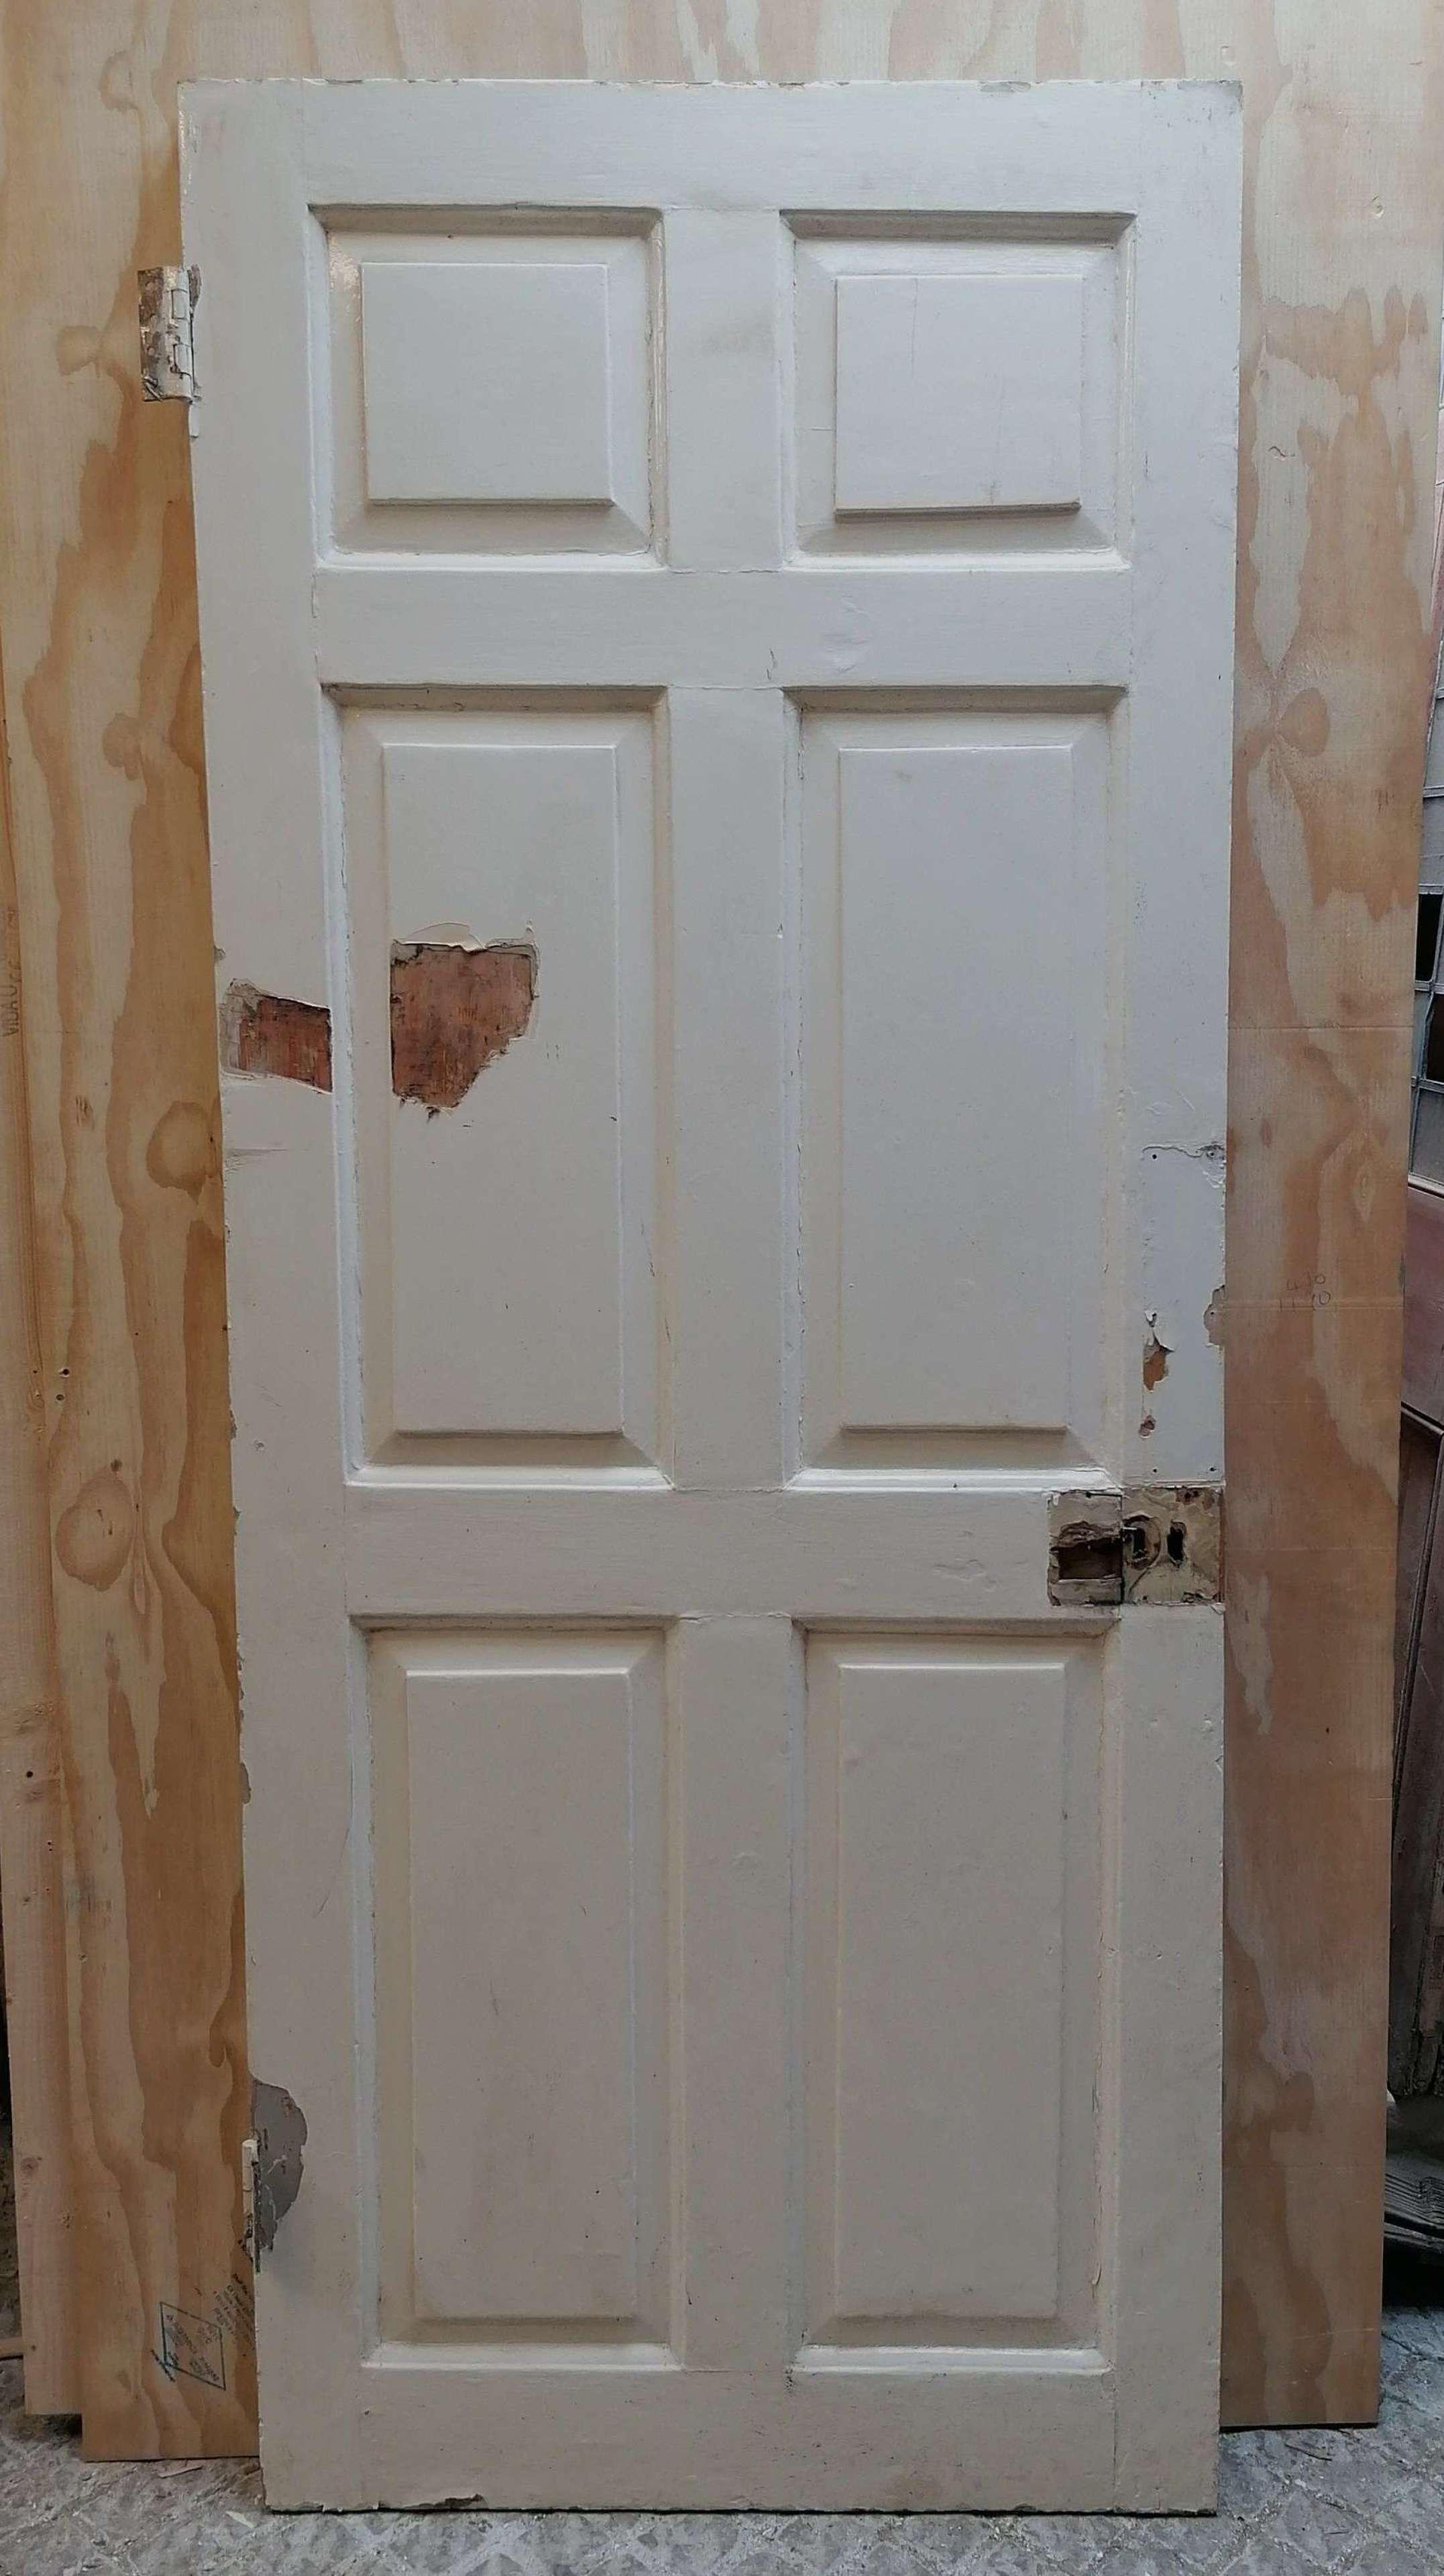 DI0746 AN ORIGINAL GEORGIAN PAINTED PINE 6 PANEL INTERNAL DOOR